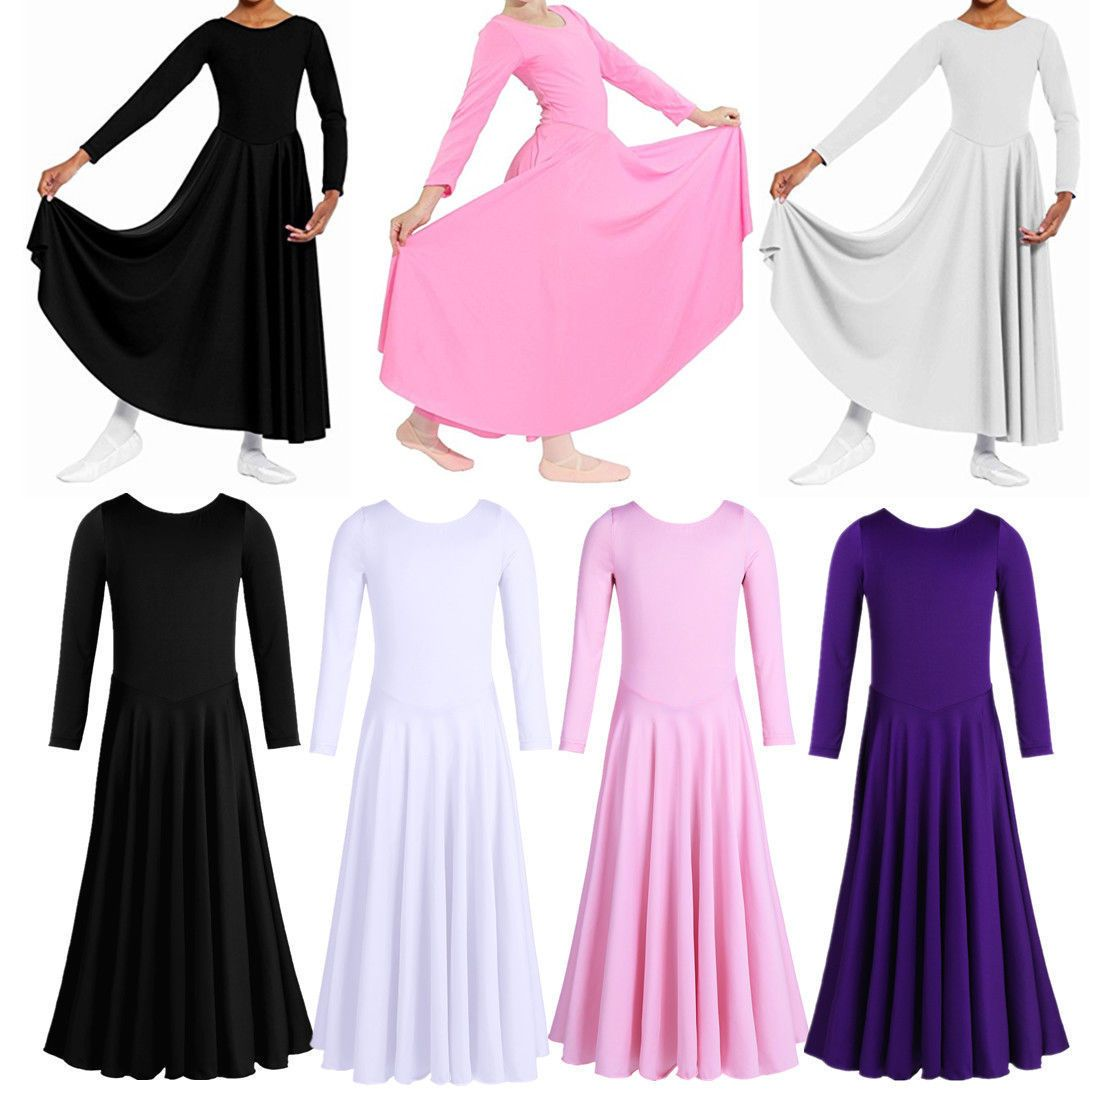 Liturgicalpraise child dance dress for kid girls plain long sleeve